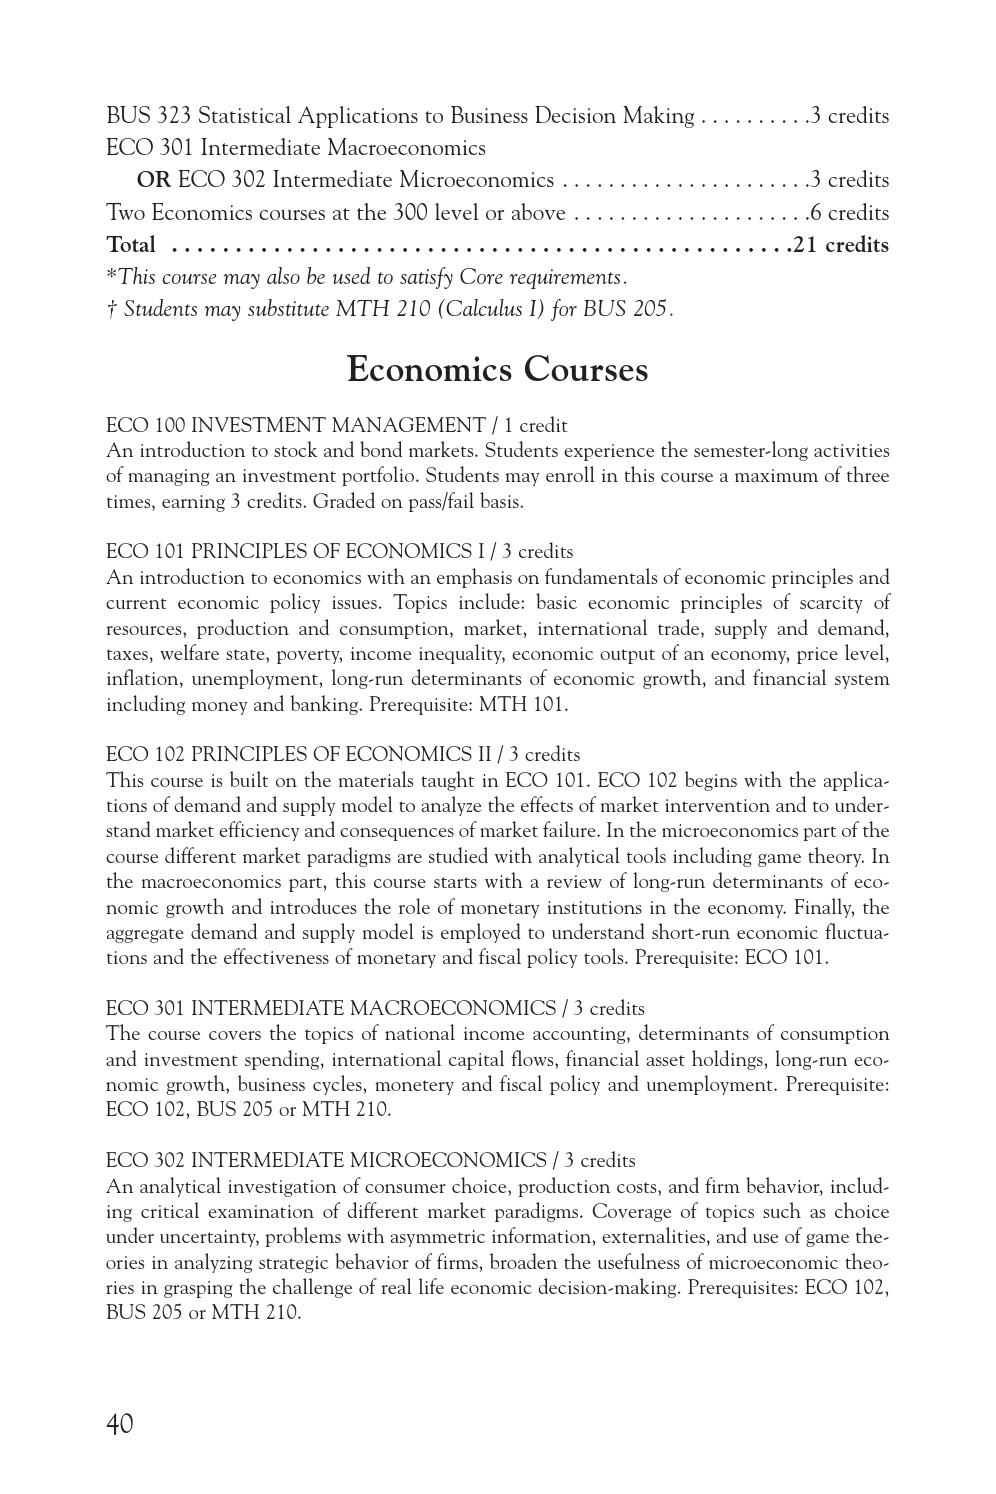 Lyon catalog 2013-14 by Lyon College - issuu